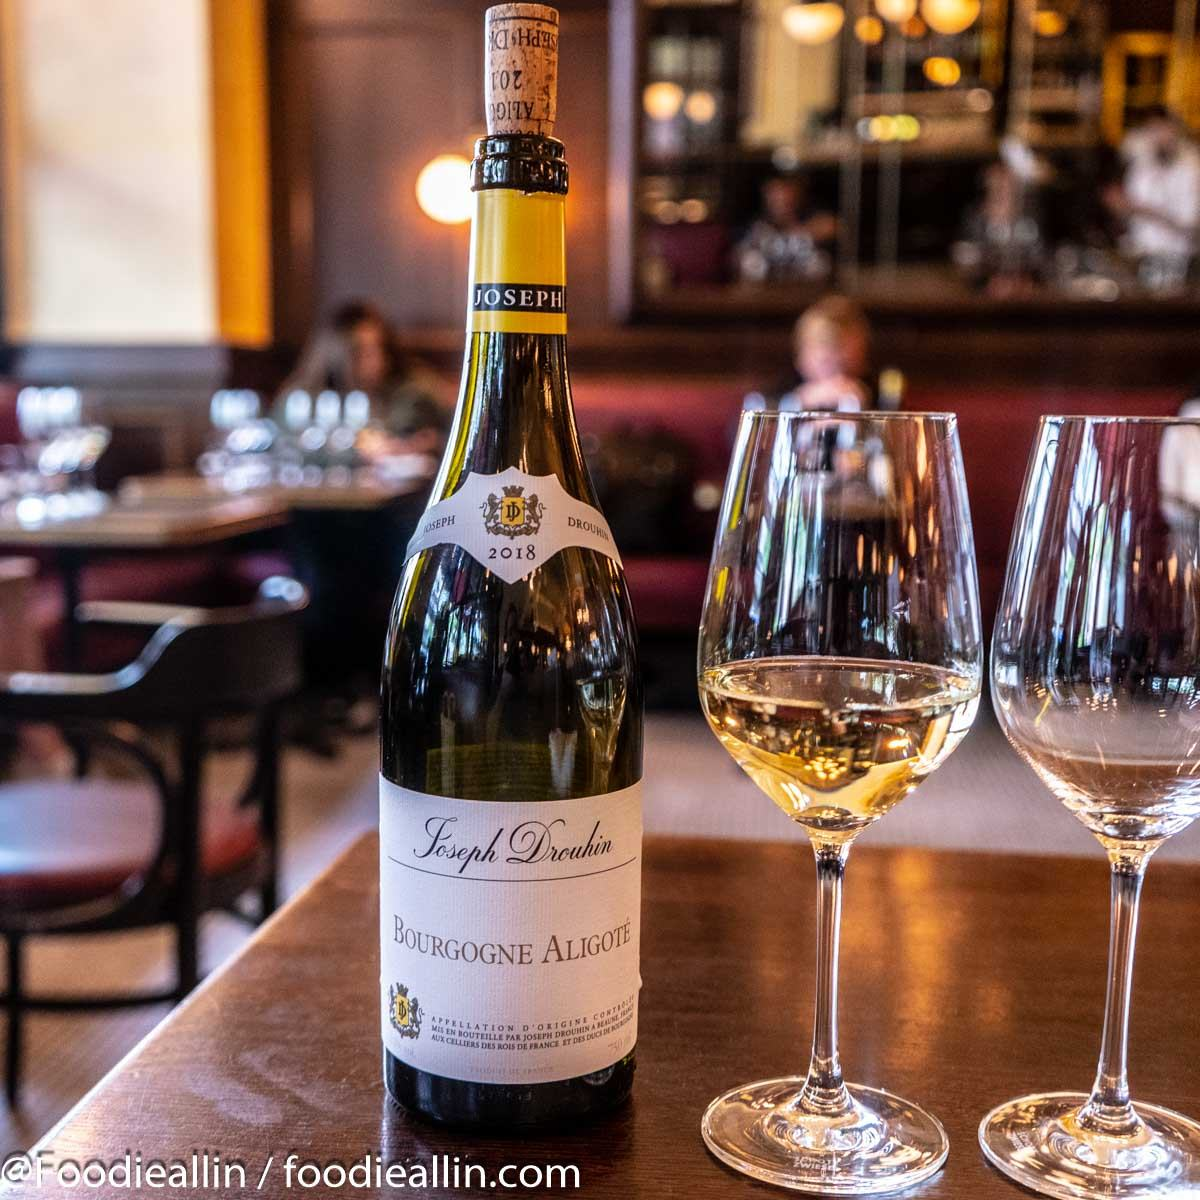 Bourgogne Aligoté from Joseph Drouhin